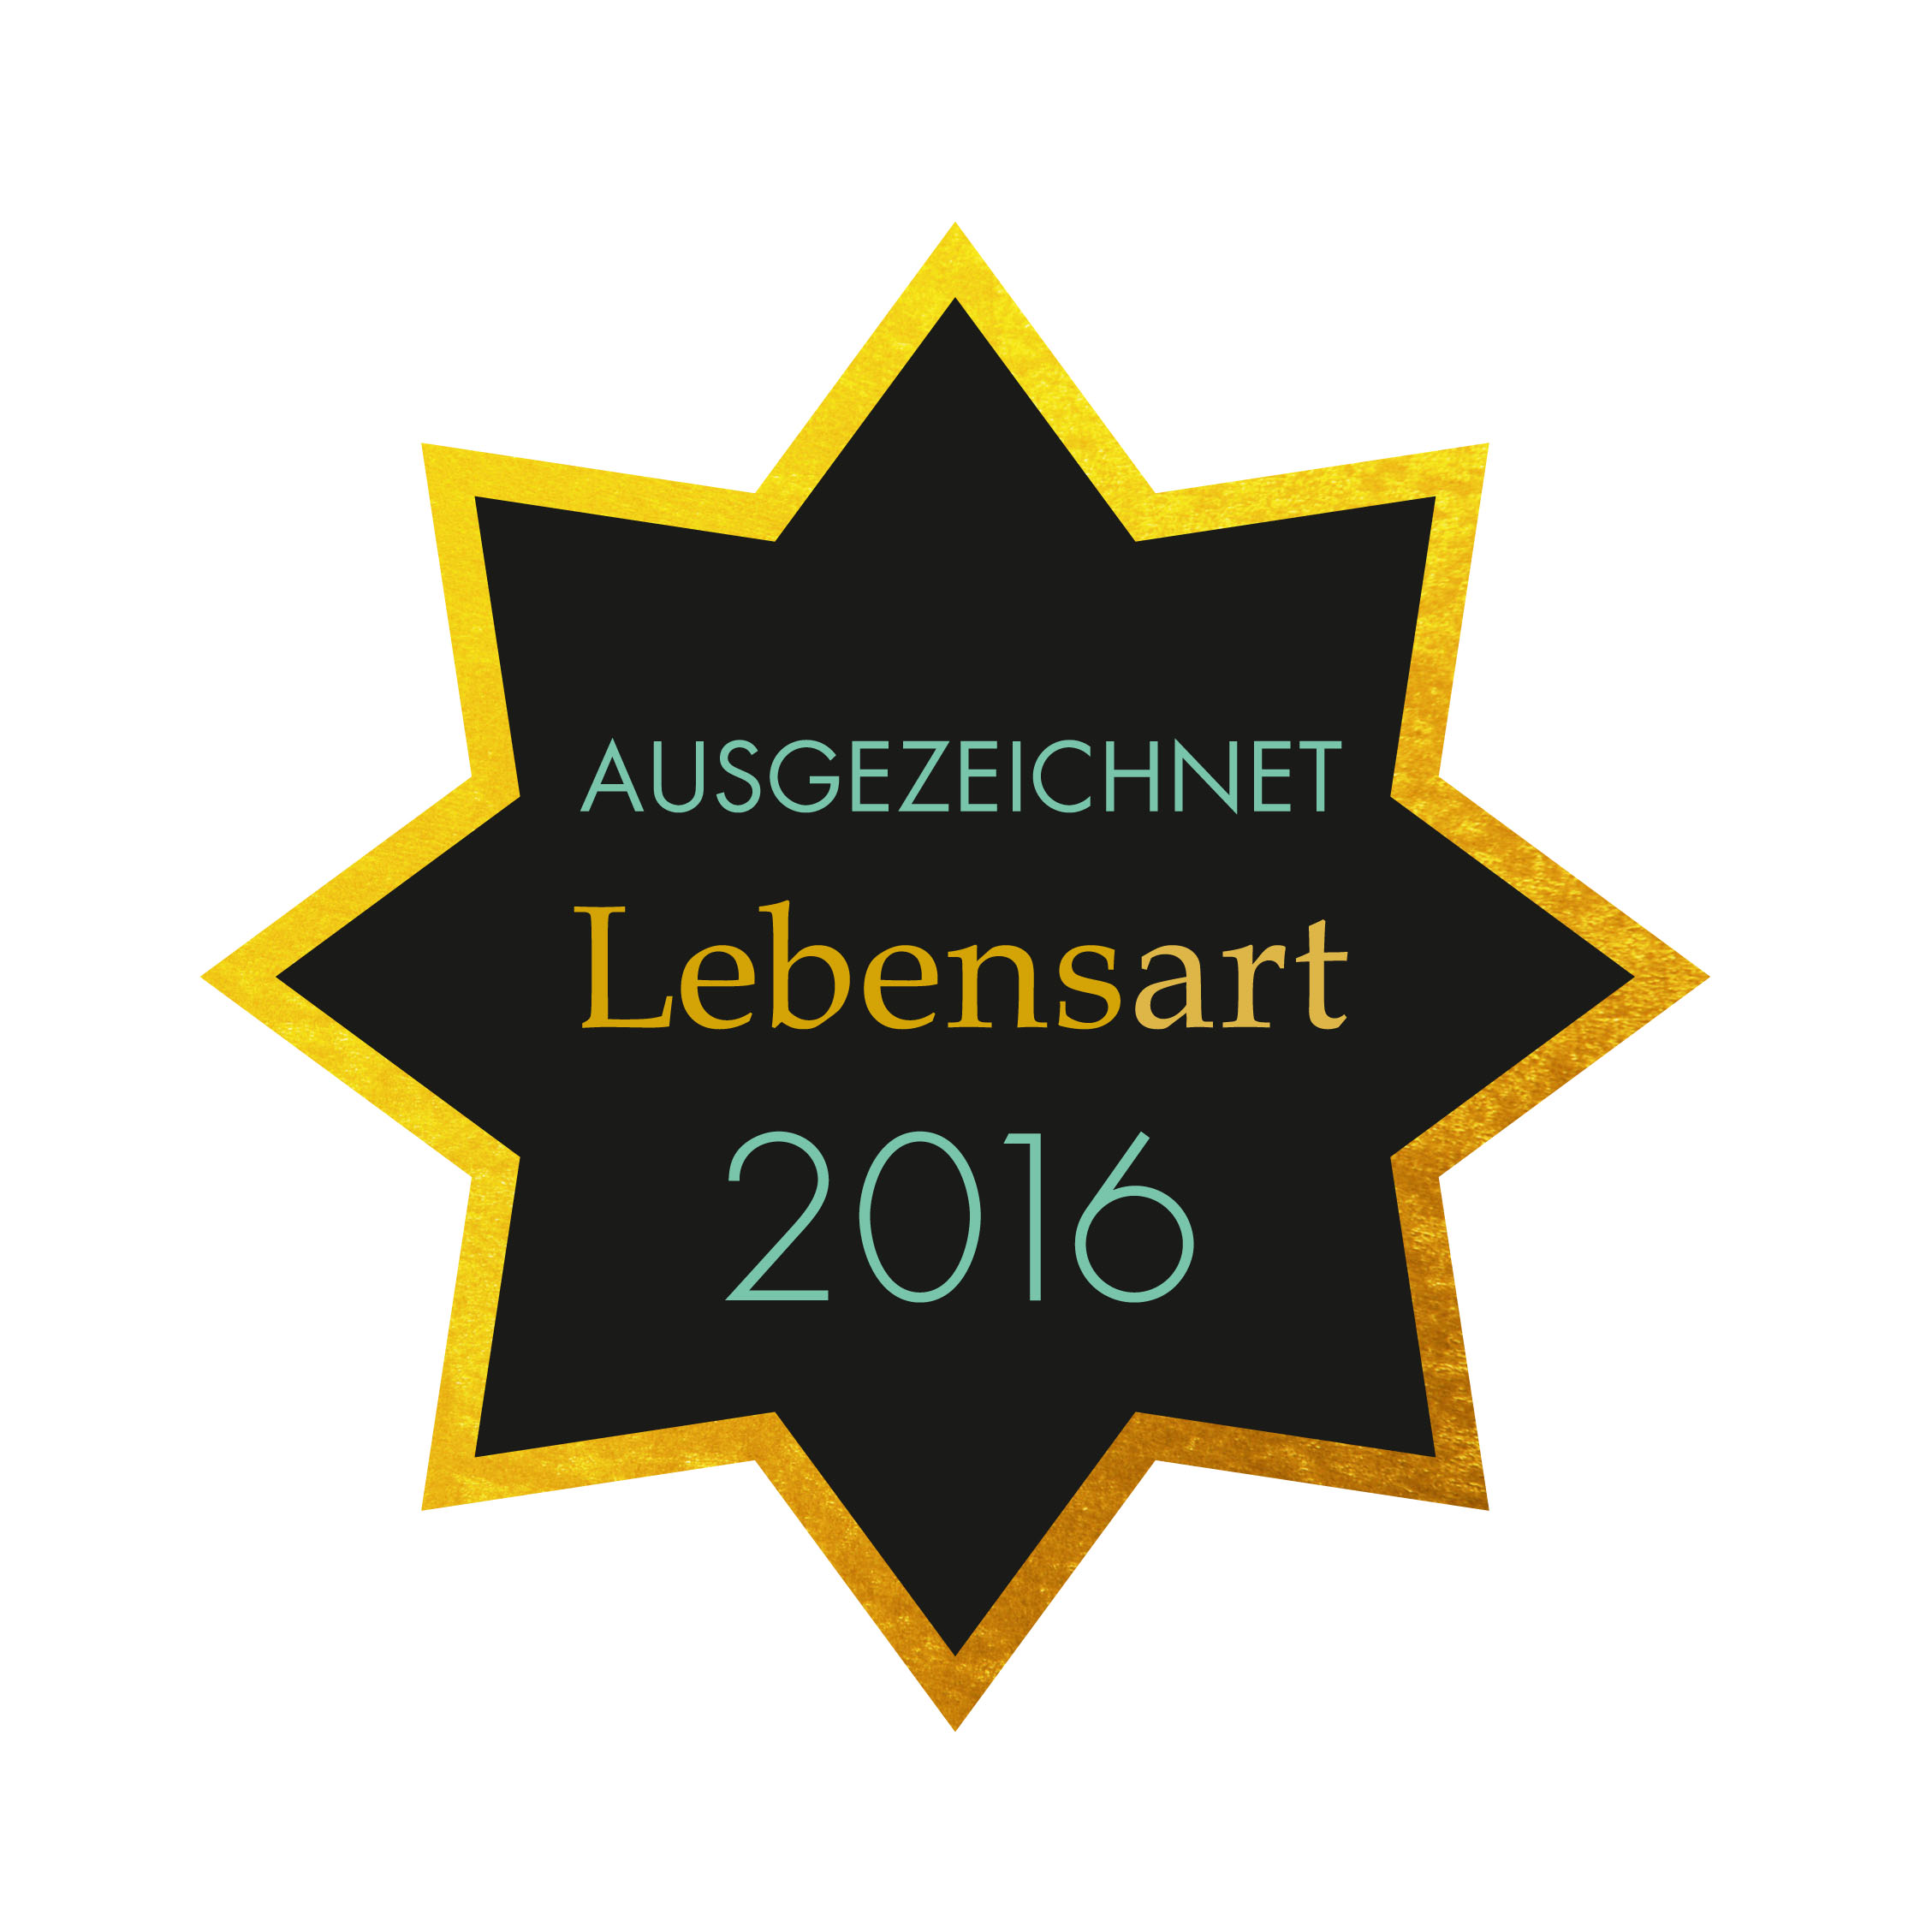 Lebensart 2016